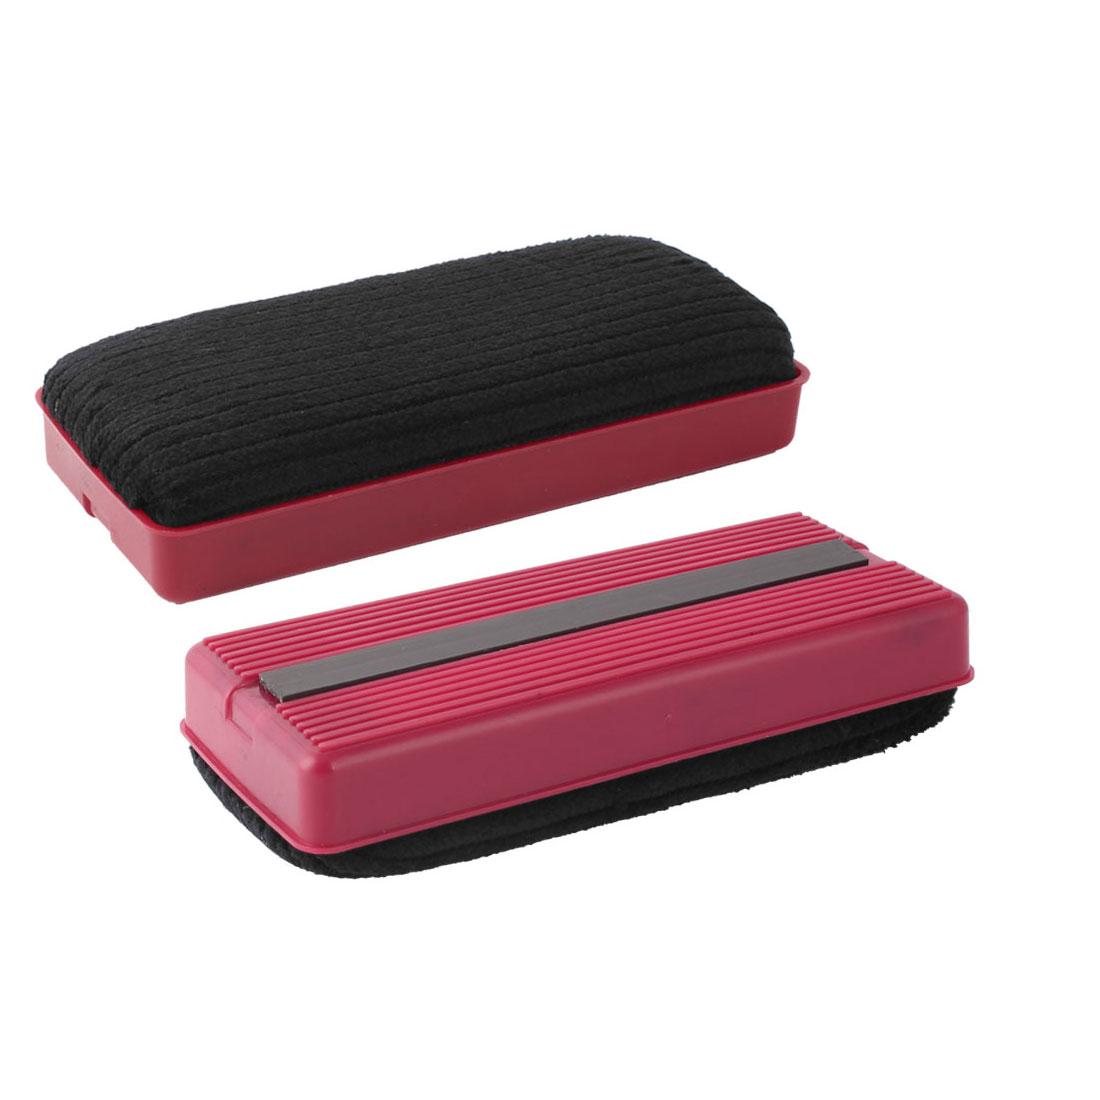 School Teaching Office Plastic Shell Magnetic Blackboard Eraser Red Black 2 Pcs